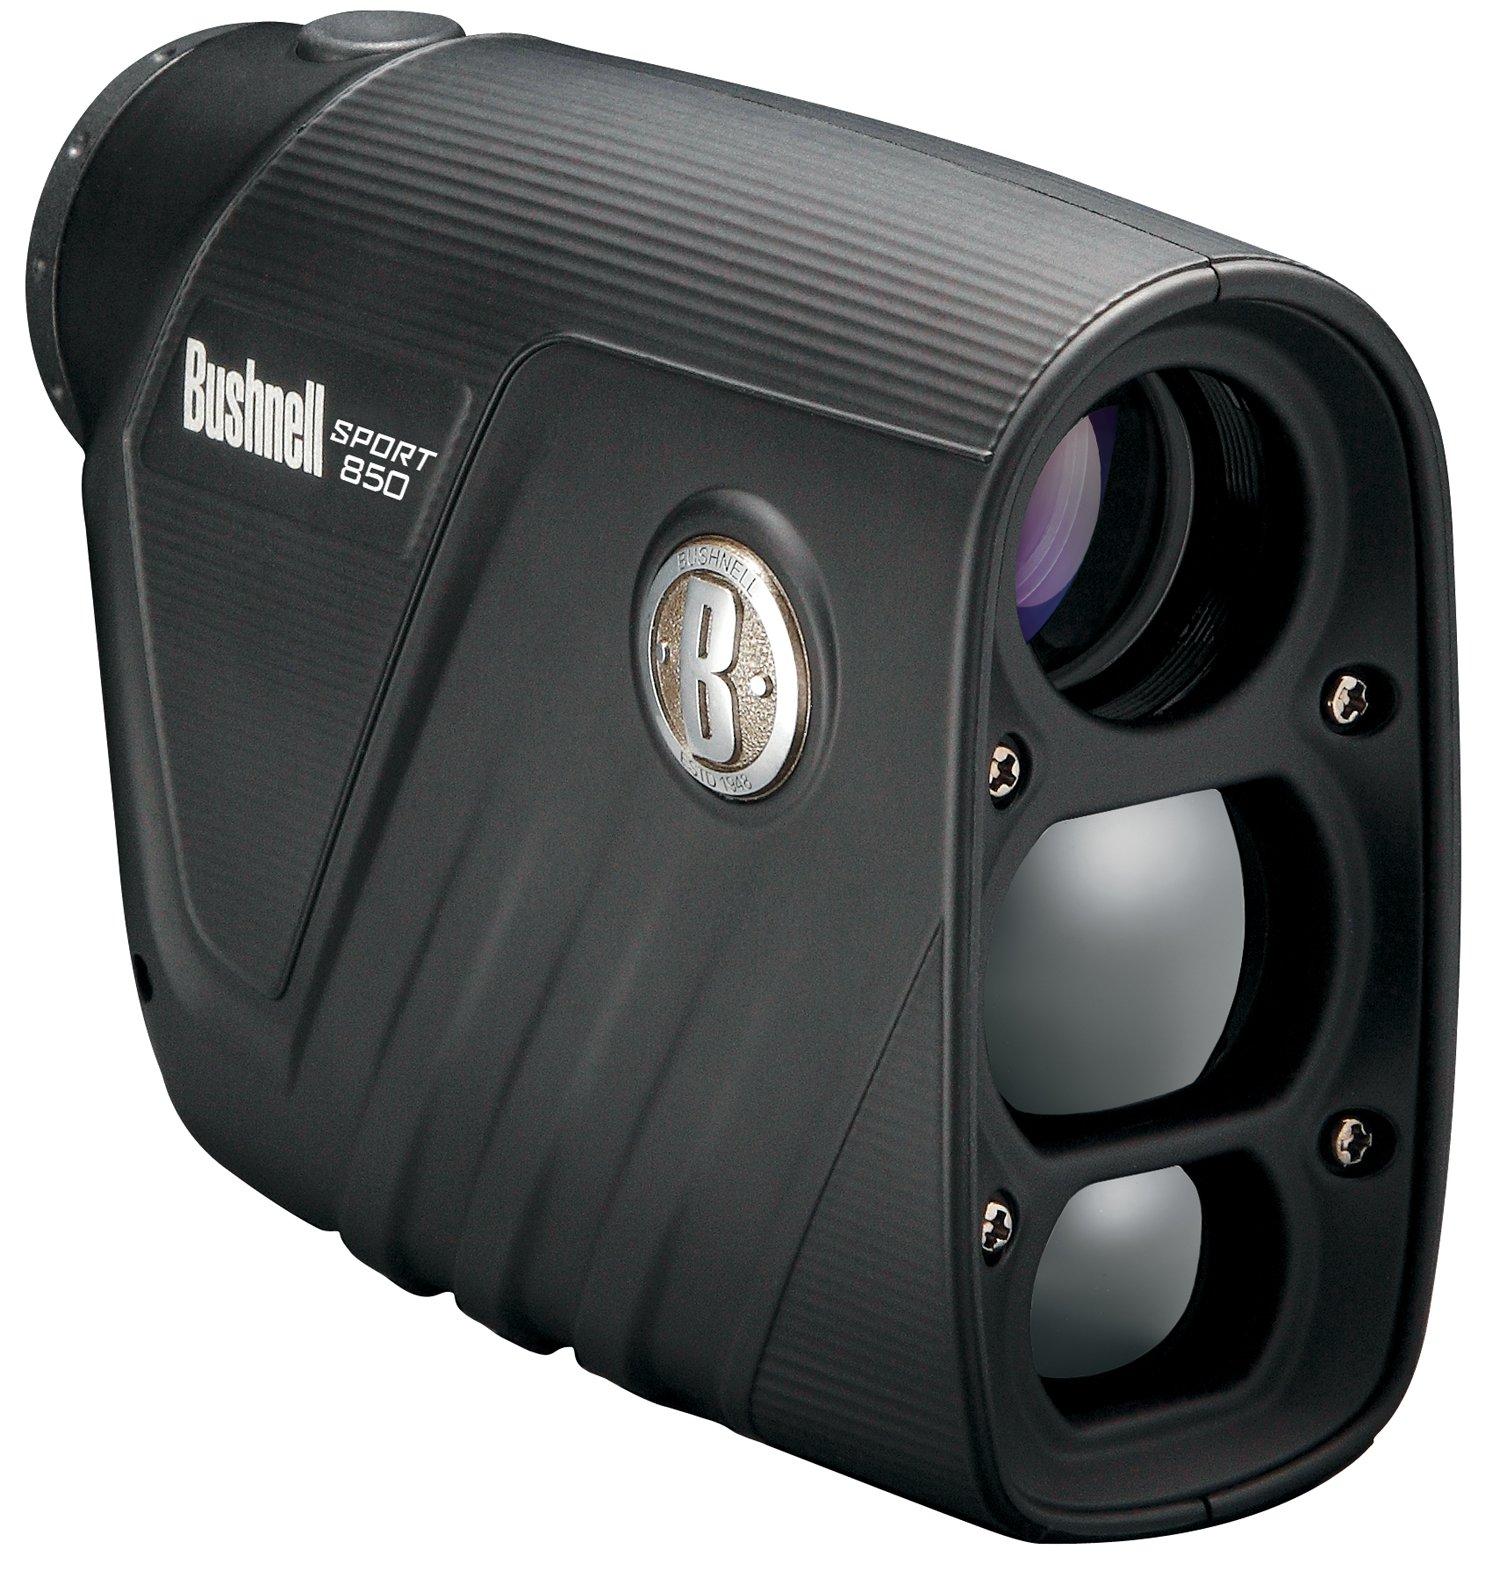 Bushnell Sport 850 4x 20mm 1-Button Operation Compact Laser Rangefinder by Bushnell